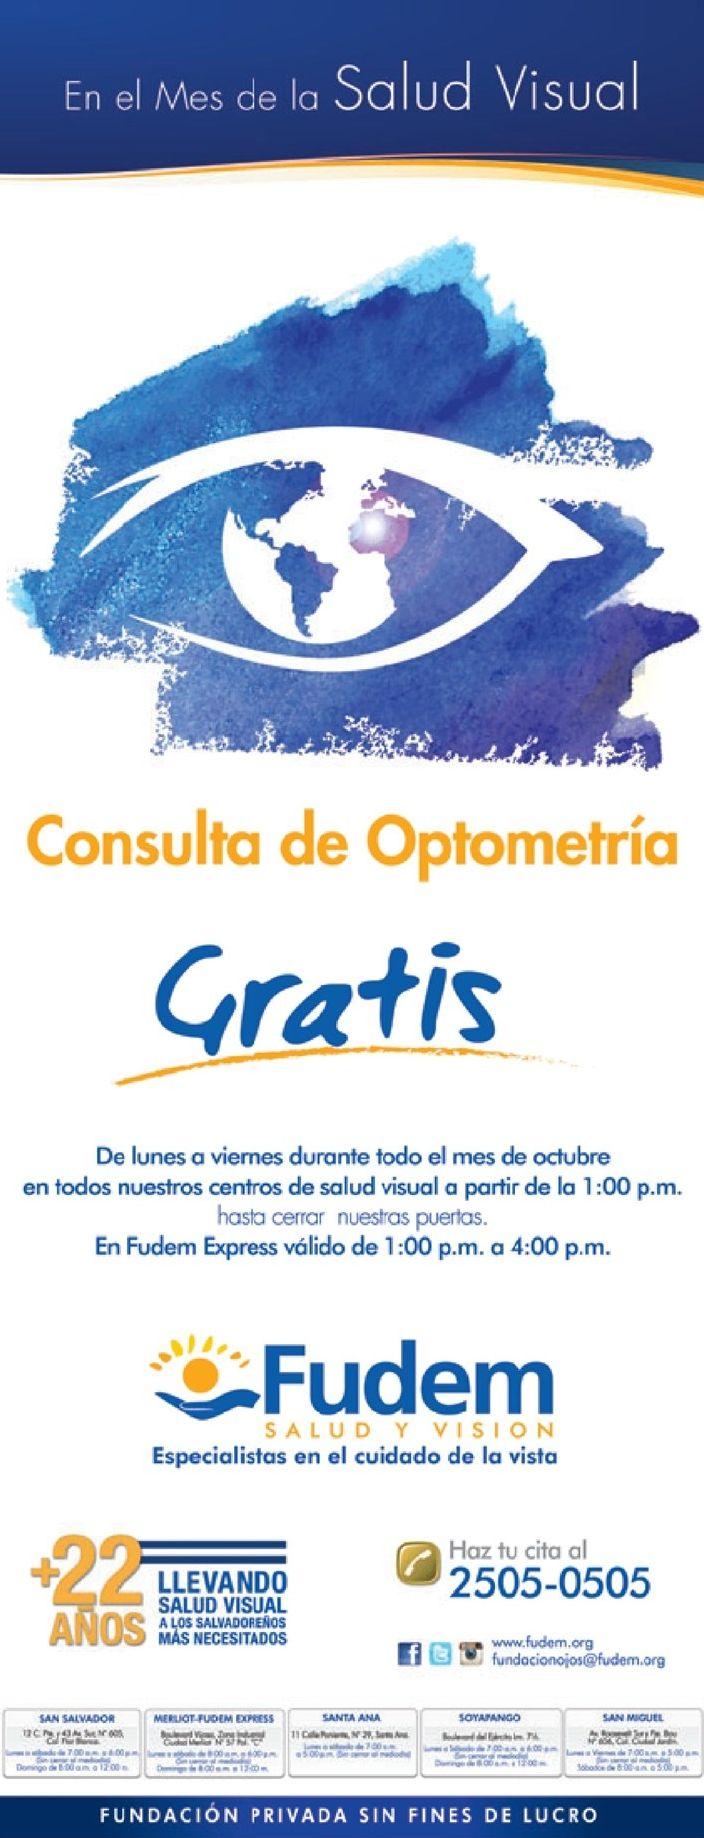 Consulta optometria GRATIS para tus ojos en FUDEM